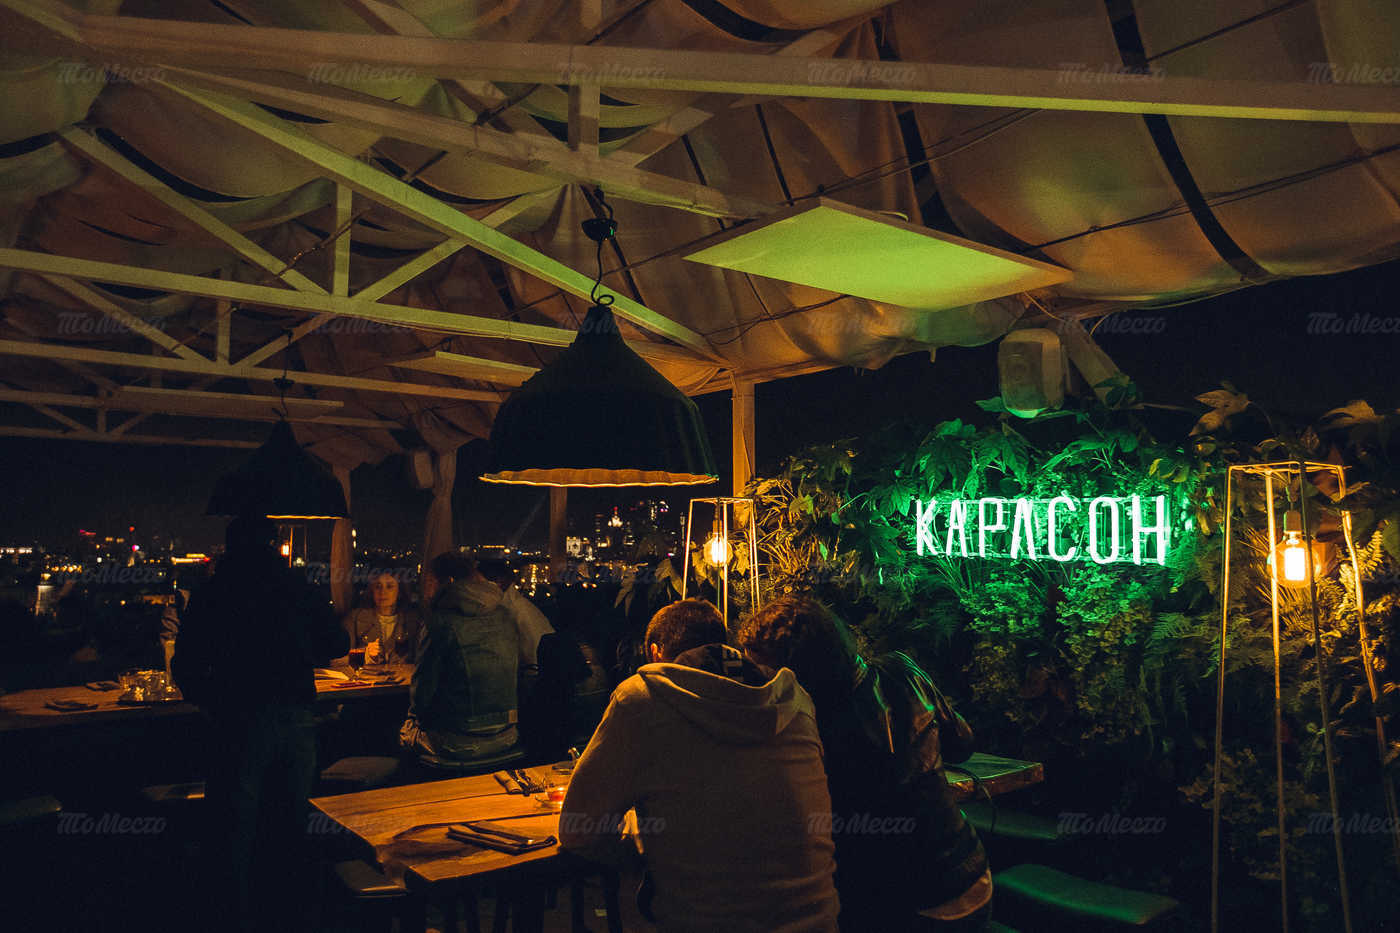 Ресторан Карлсон на Овчинниковской набережной фото 26